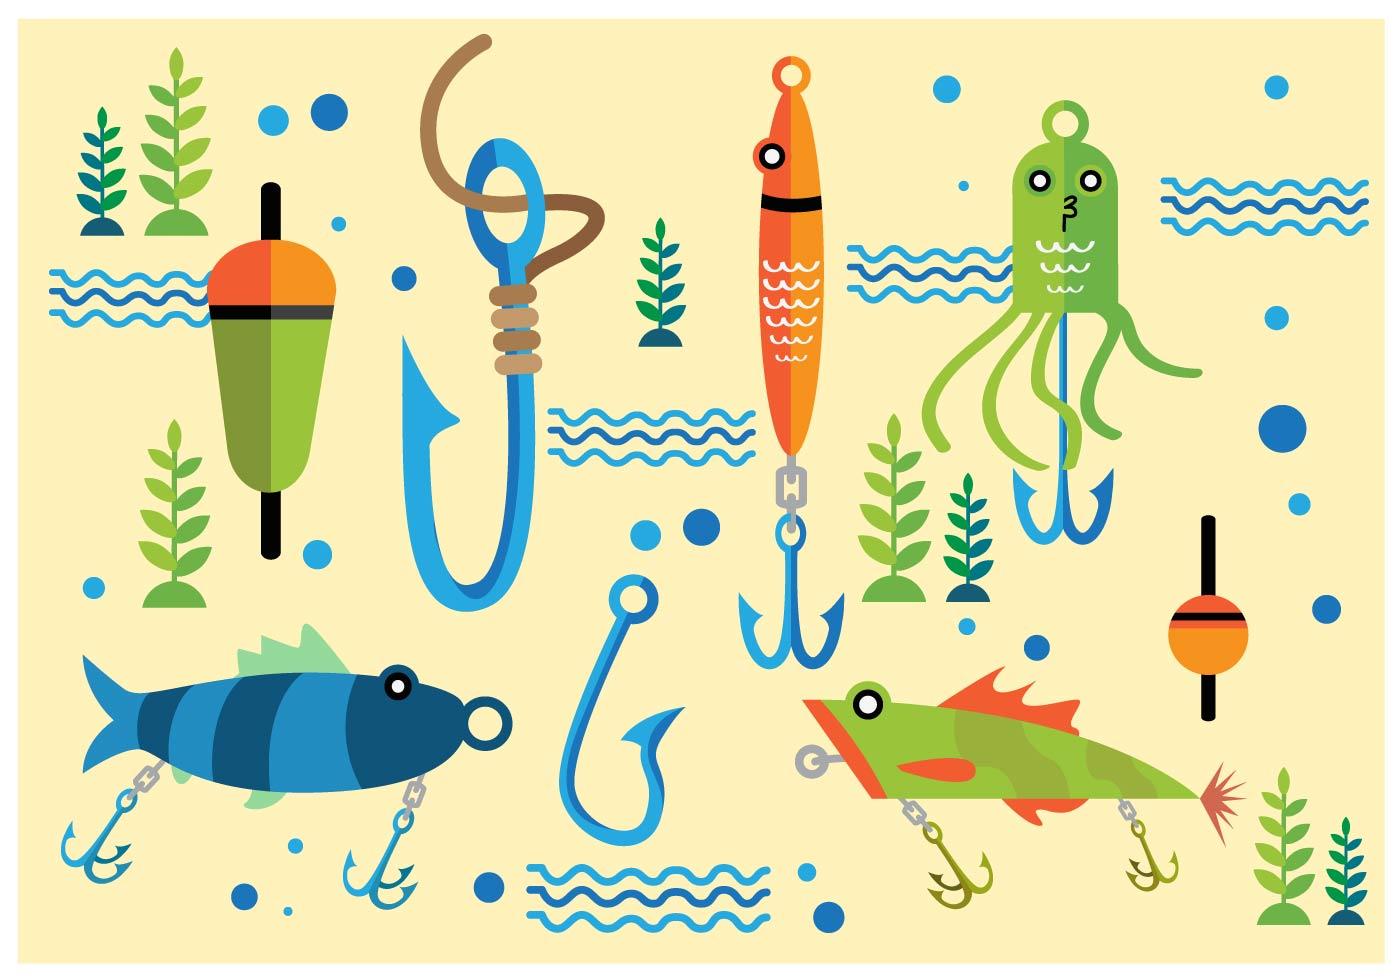 Fish Hook Free Vector Art.